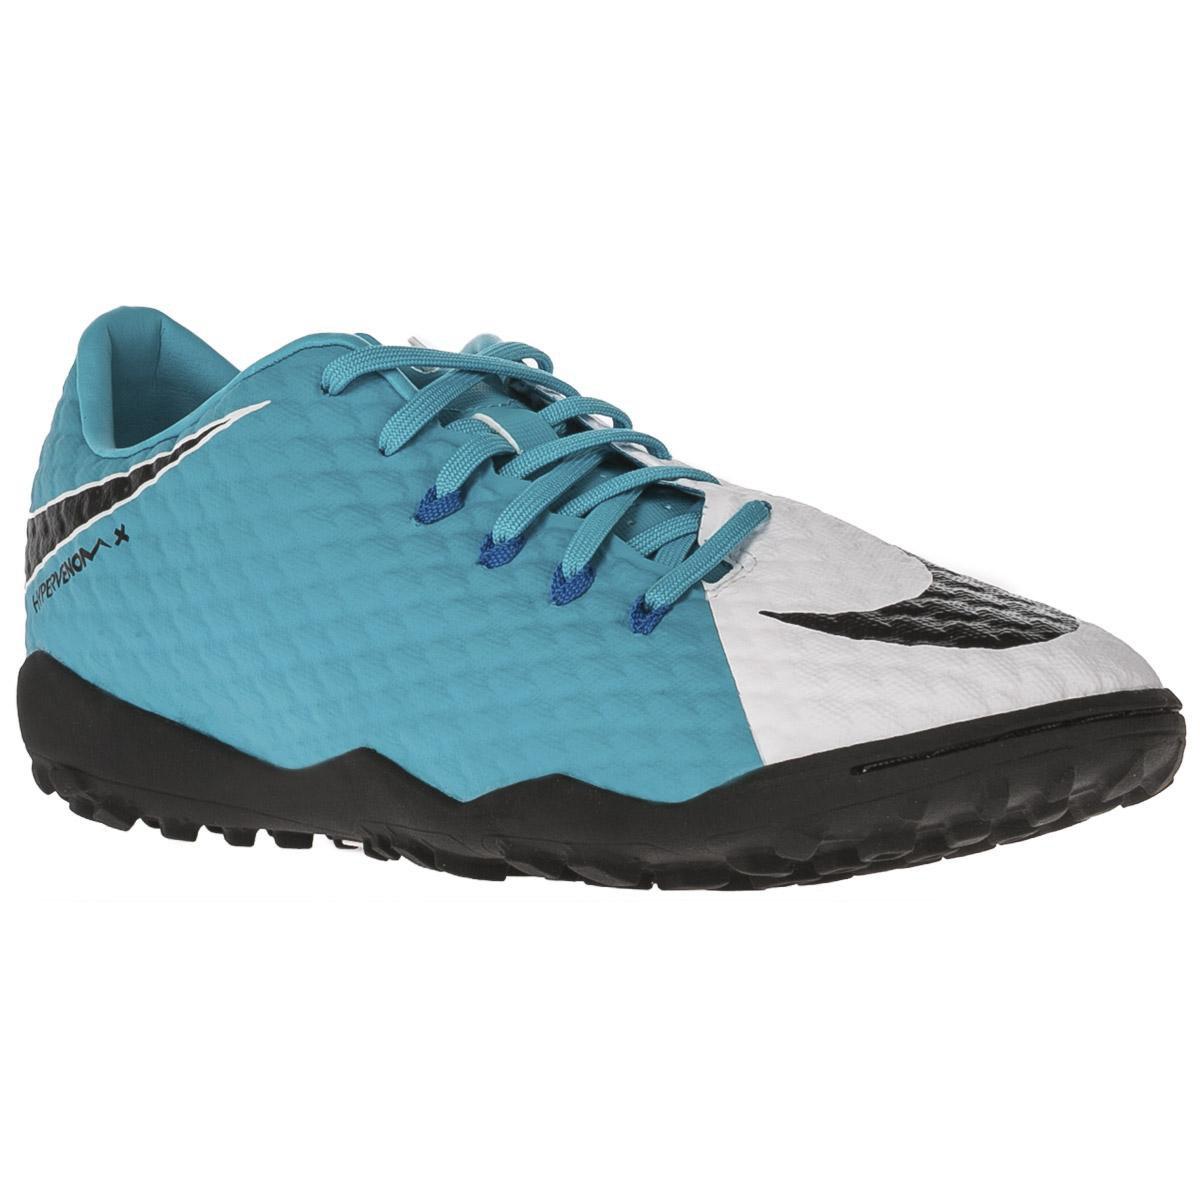 39fd1ec359 Chuteira Society Nike Hypervenom X Phelon III TF - Compre Agora ...